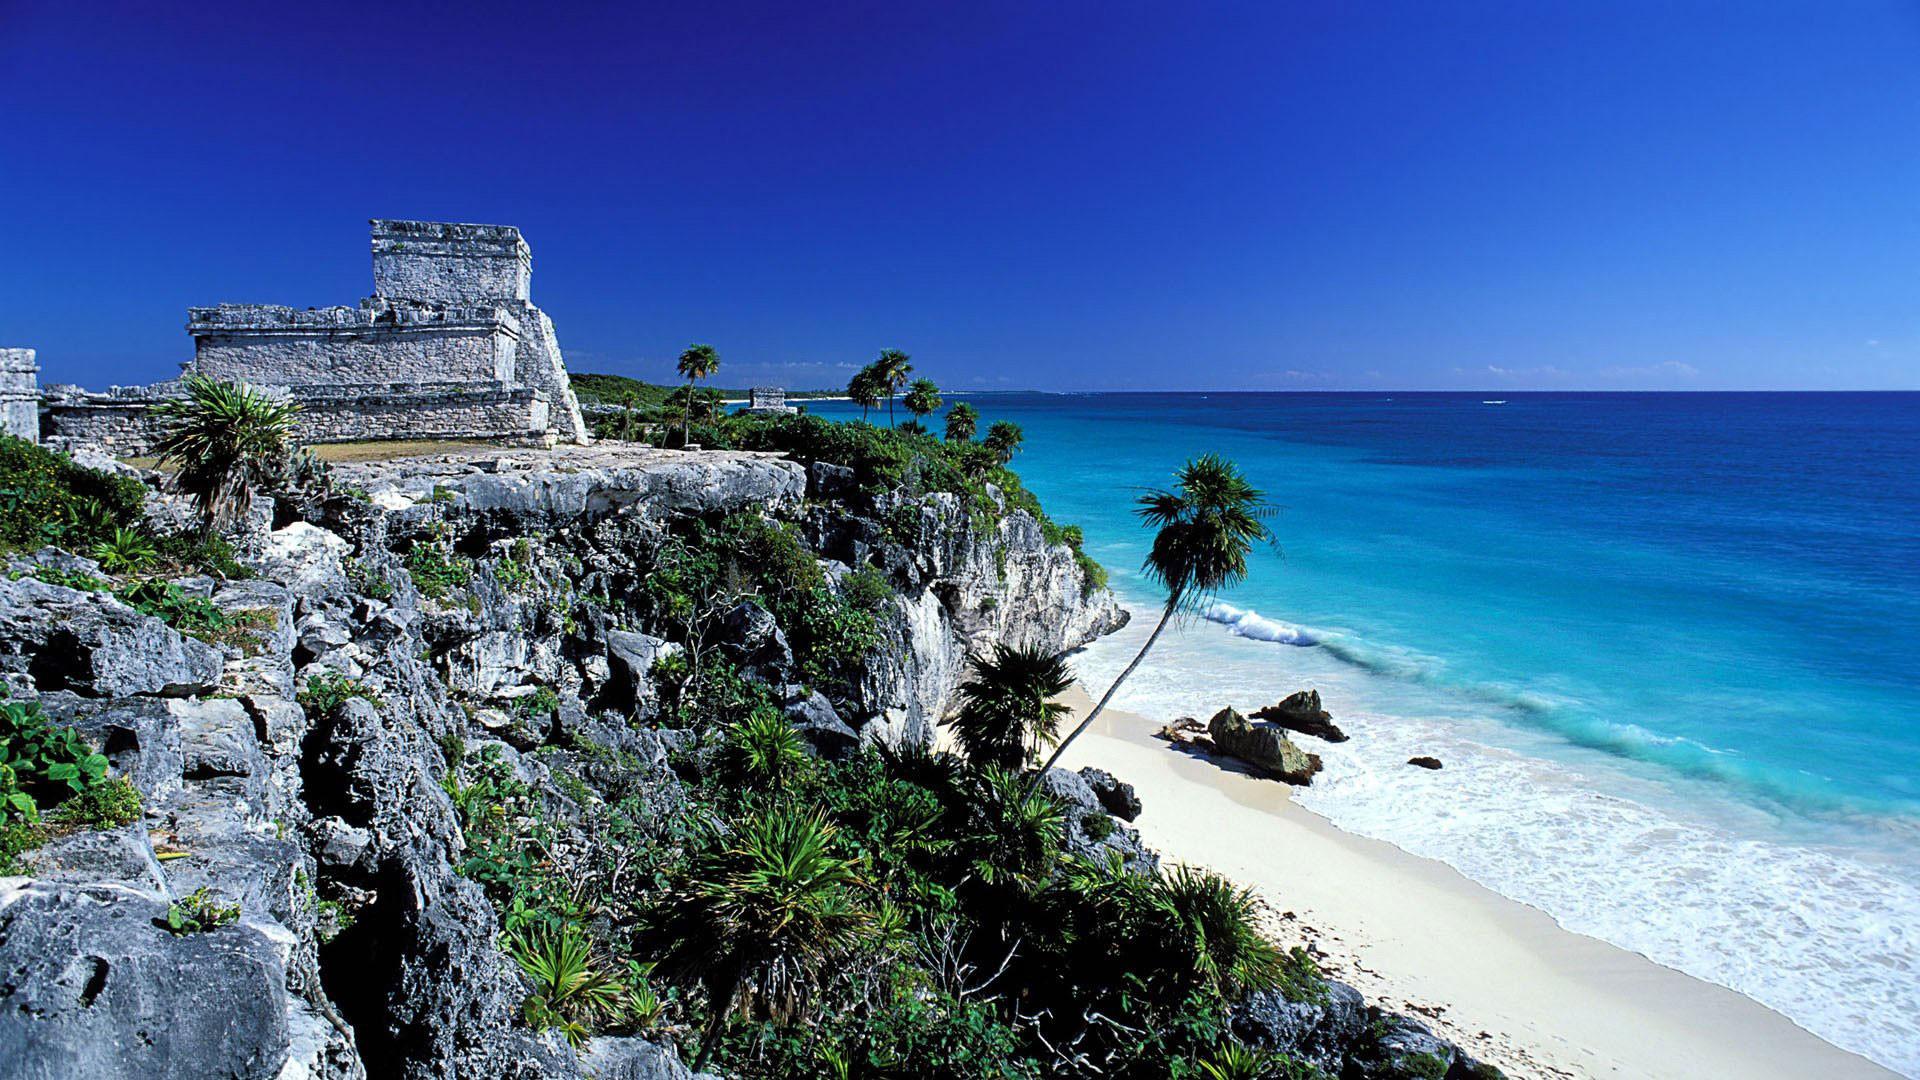 hd pics photos travel beach places best world tour desktop background  wallpaper